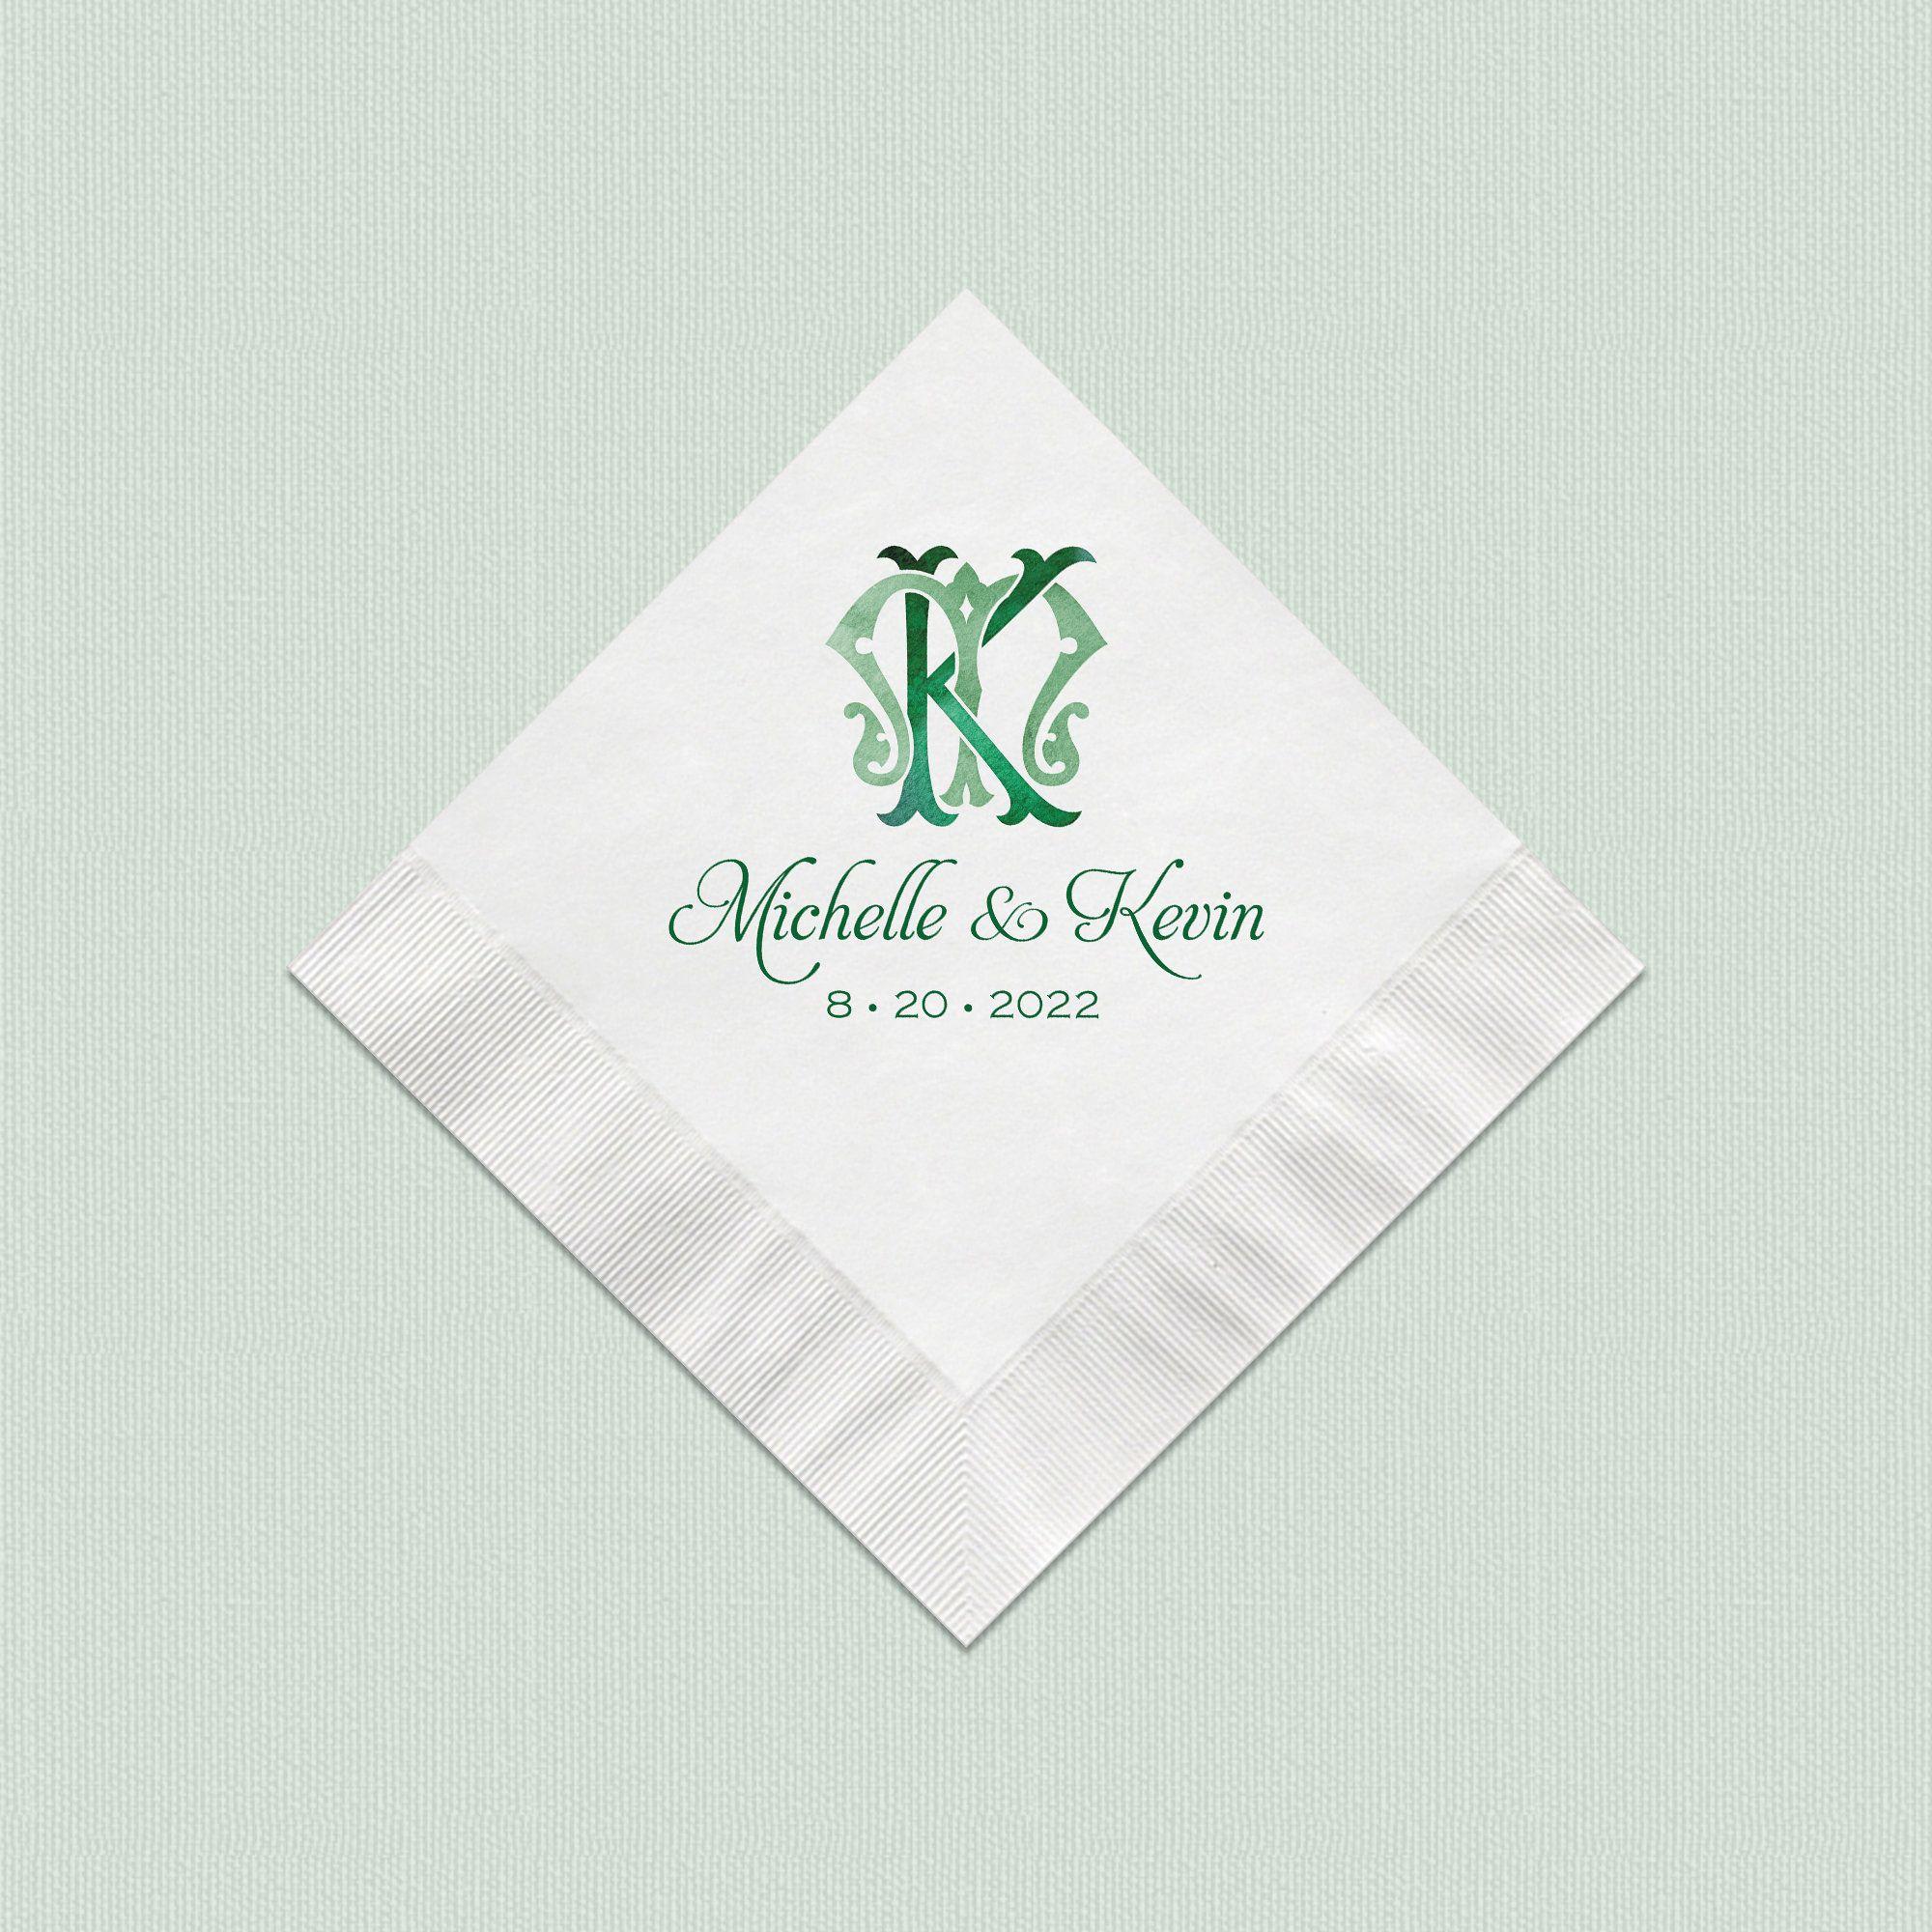 Monogram Wedding Napkins, Personalized Beverage Napkins